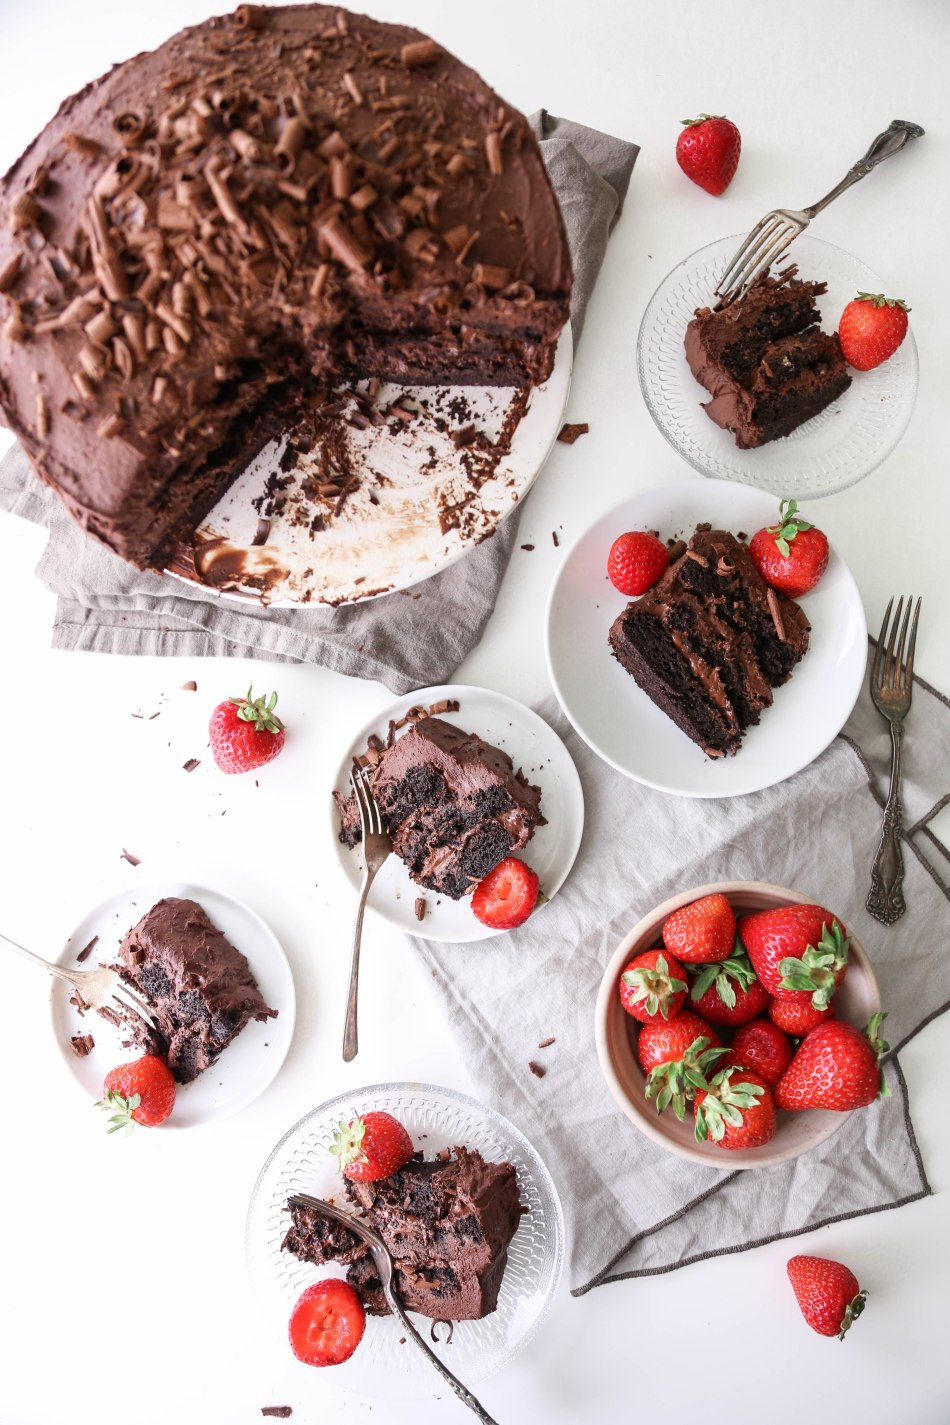 Vegan Chocolate Cake with Whipped Ganache | Vegan and Gluten-Free | Wife Mama Foodie